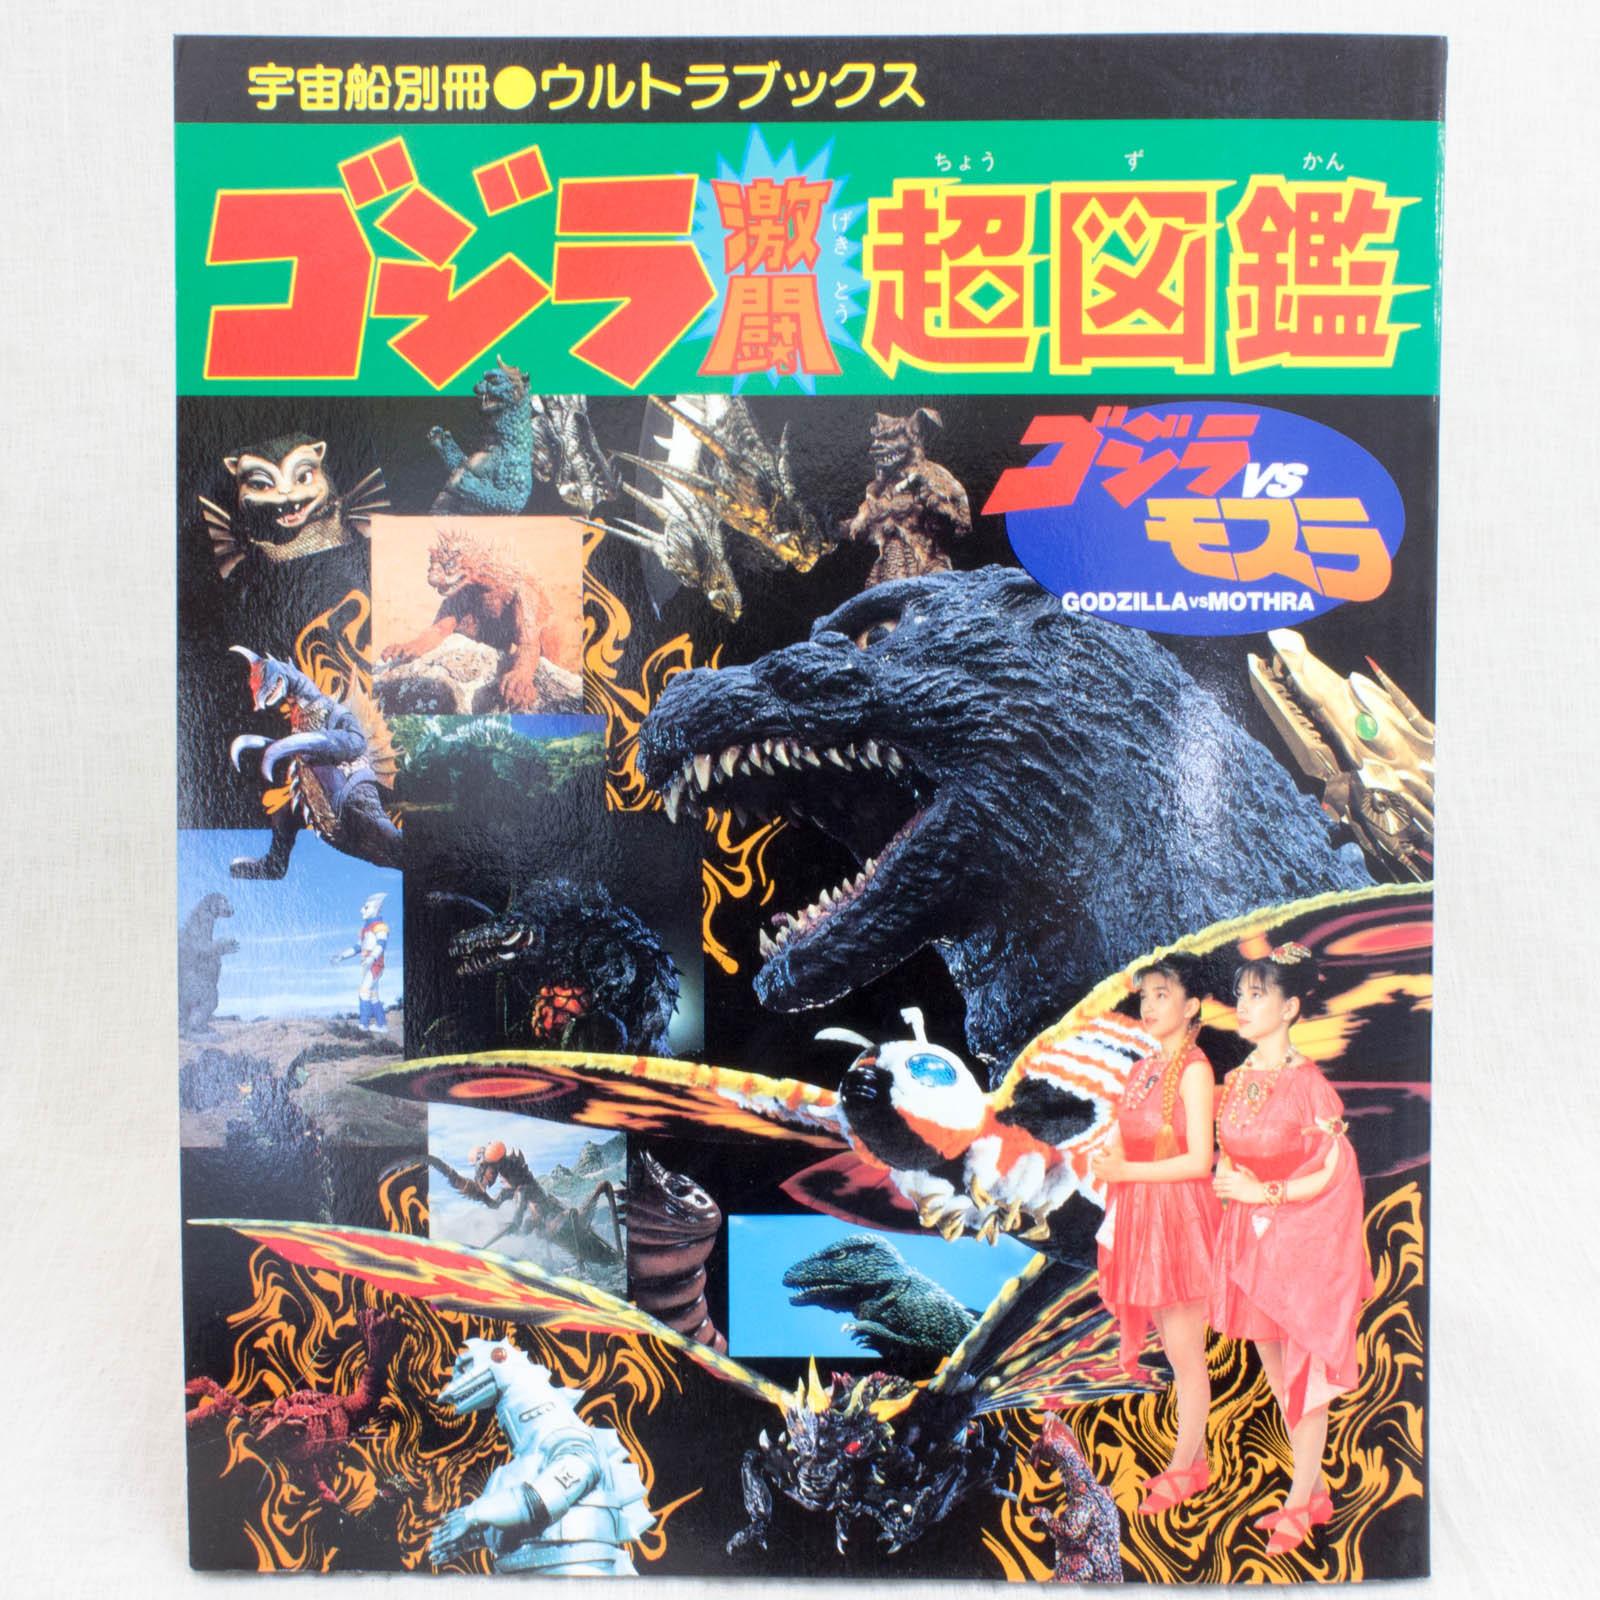 Godzilla Gekito Cho Zukan Picture Book JAPAN TOKUSATSU